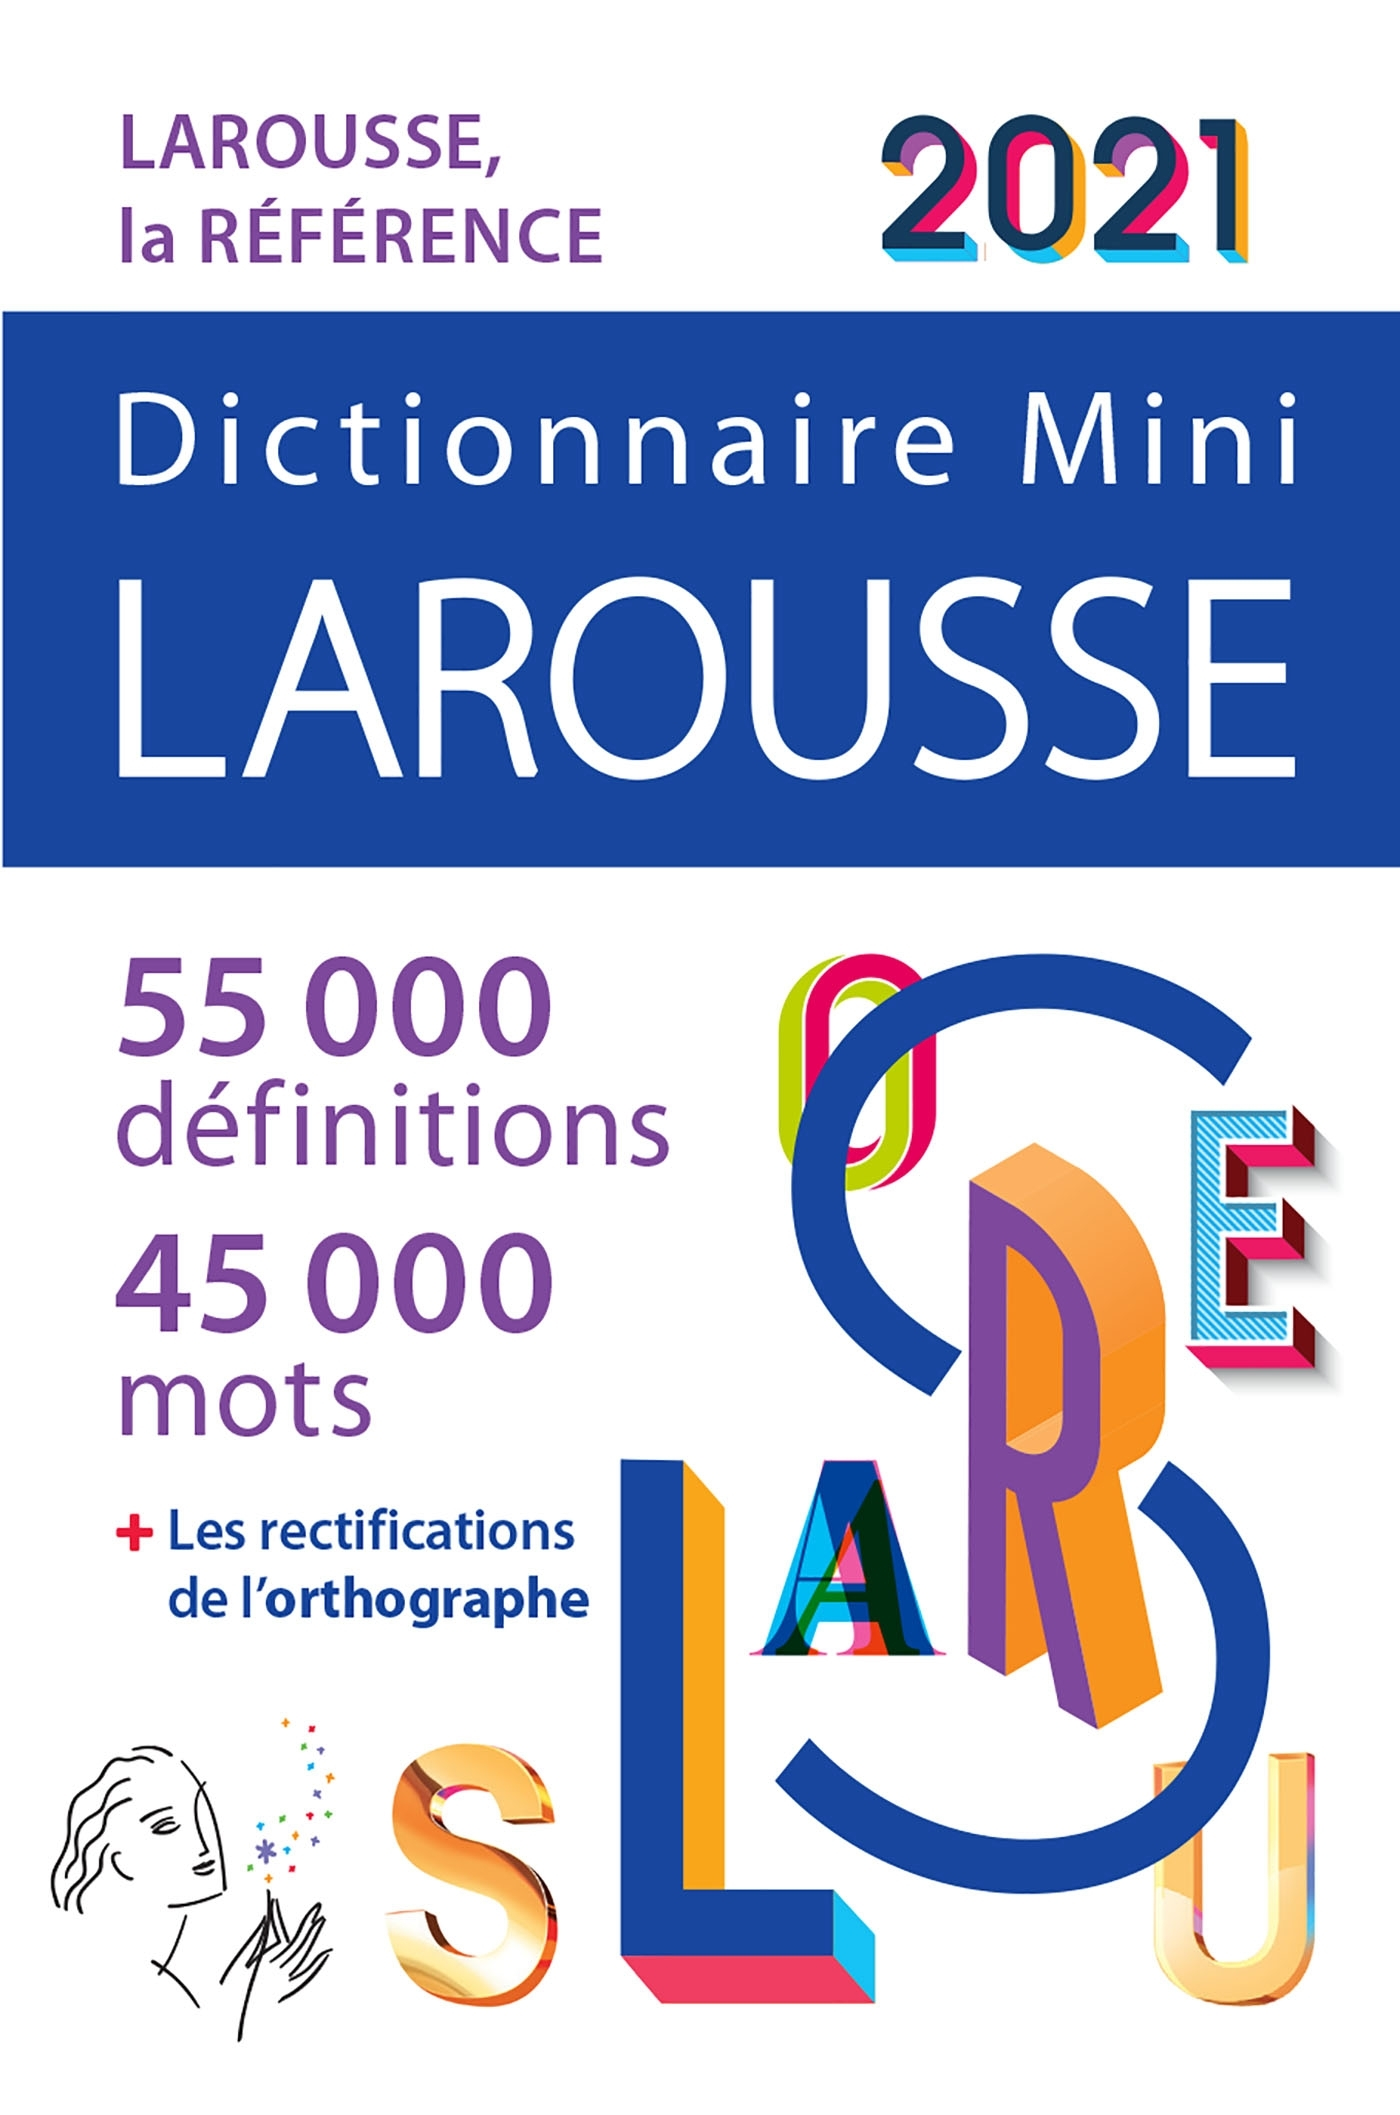 DICTIONNAIRE LAROUSSE MINI 2021